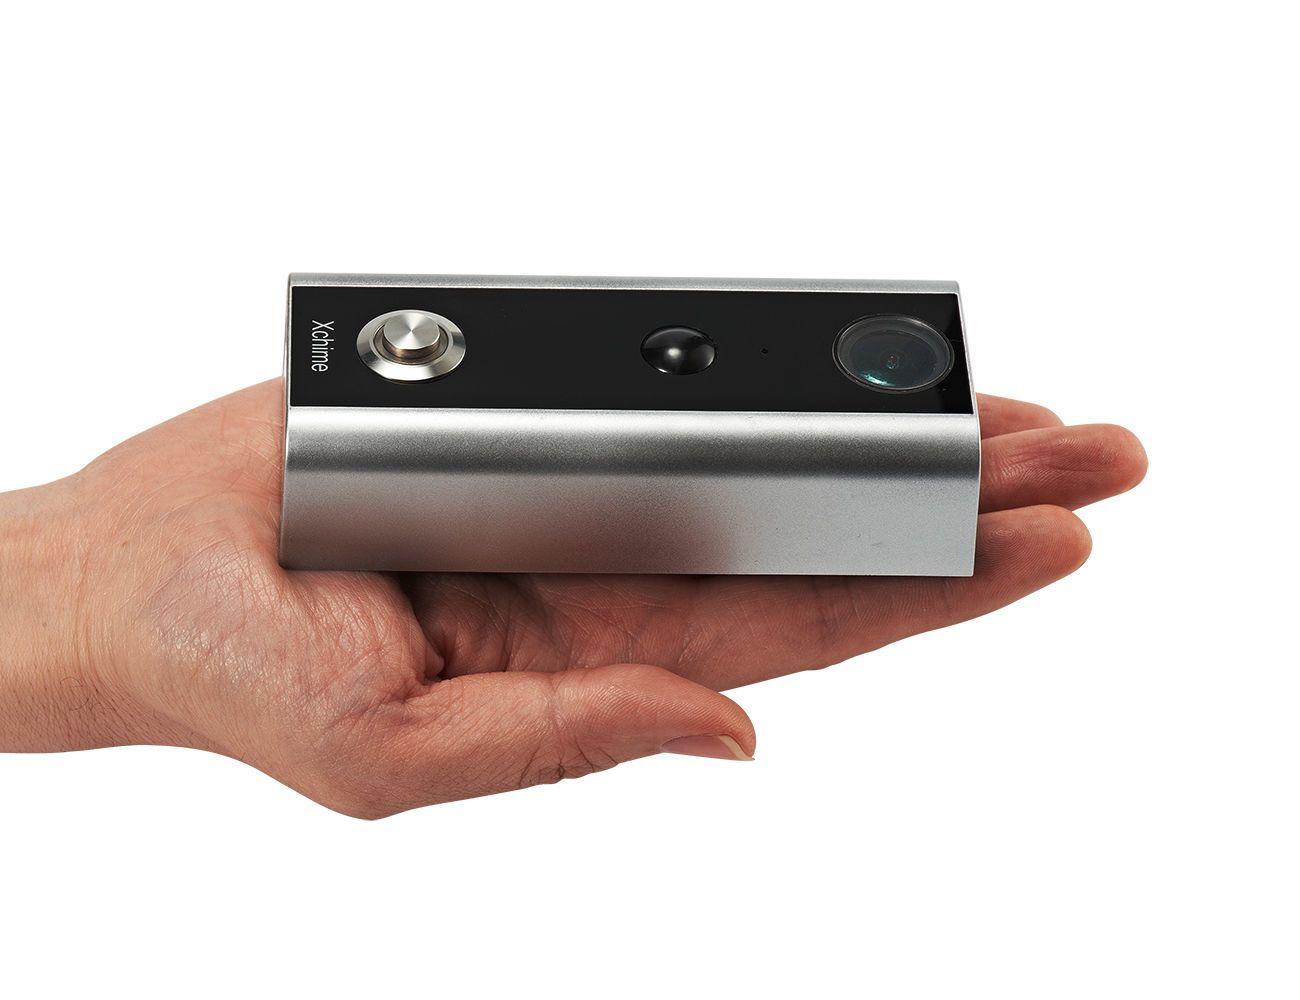 Xchime Video Doorbell & Motion Detect Smart Alerts